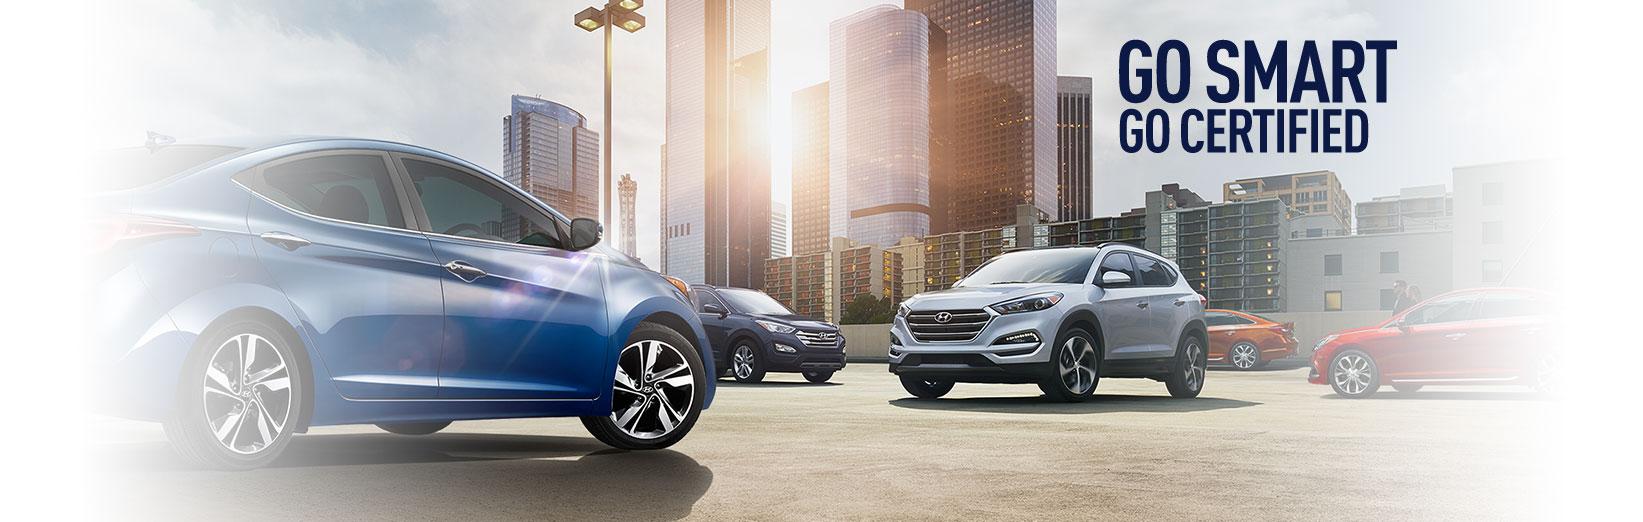 Marvelous Hyundai CPO Program